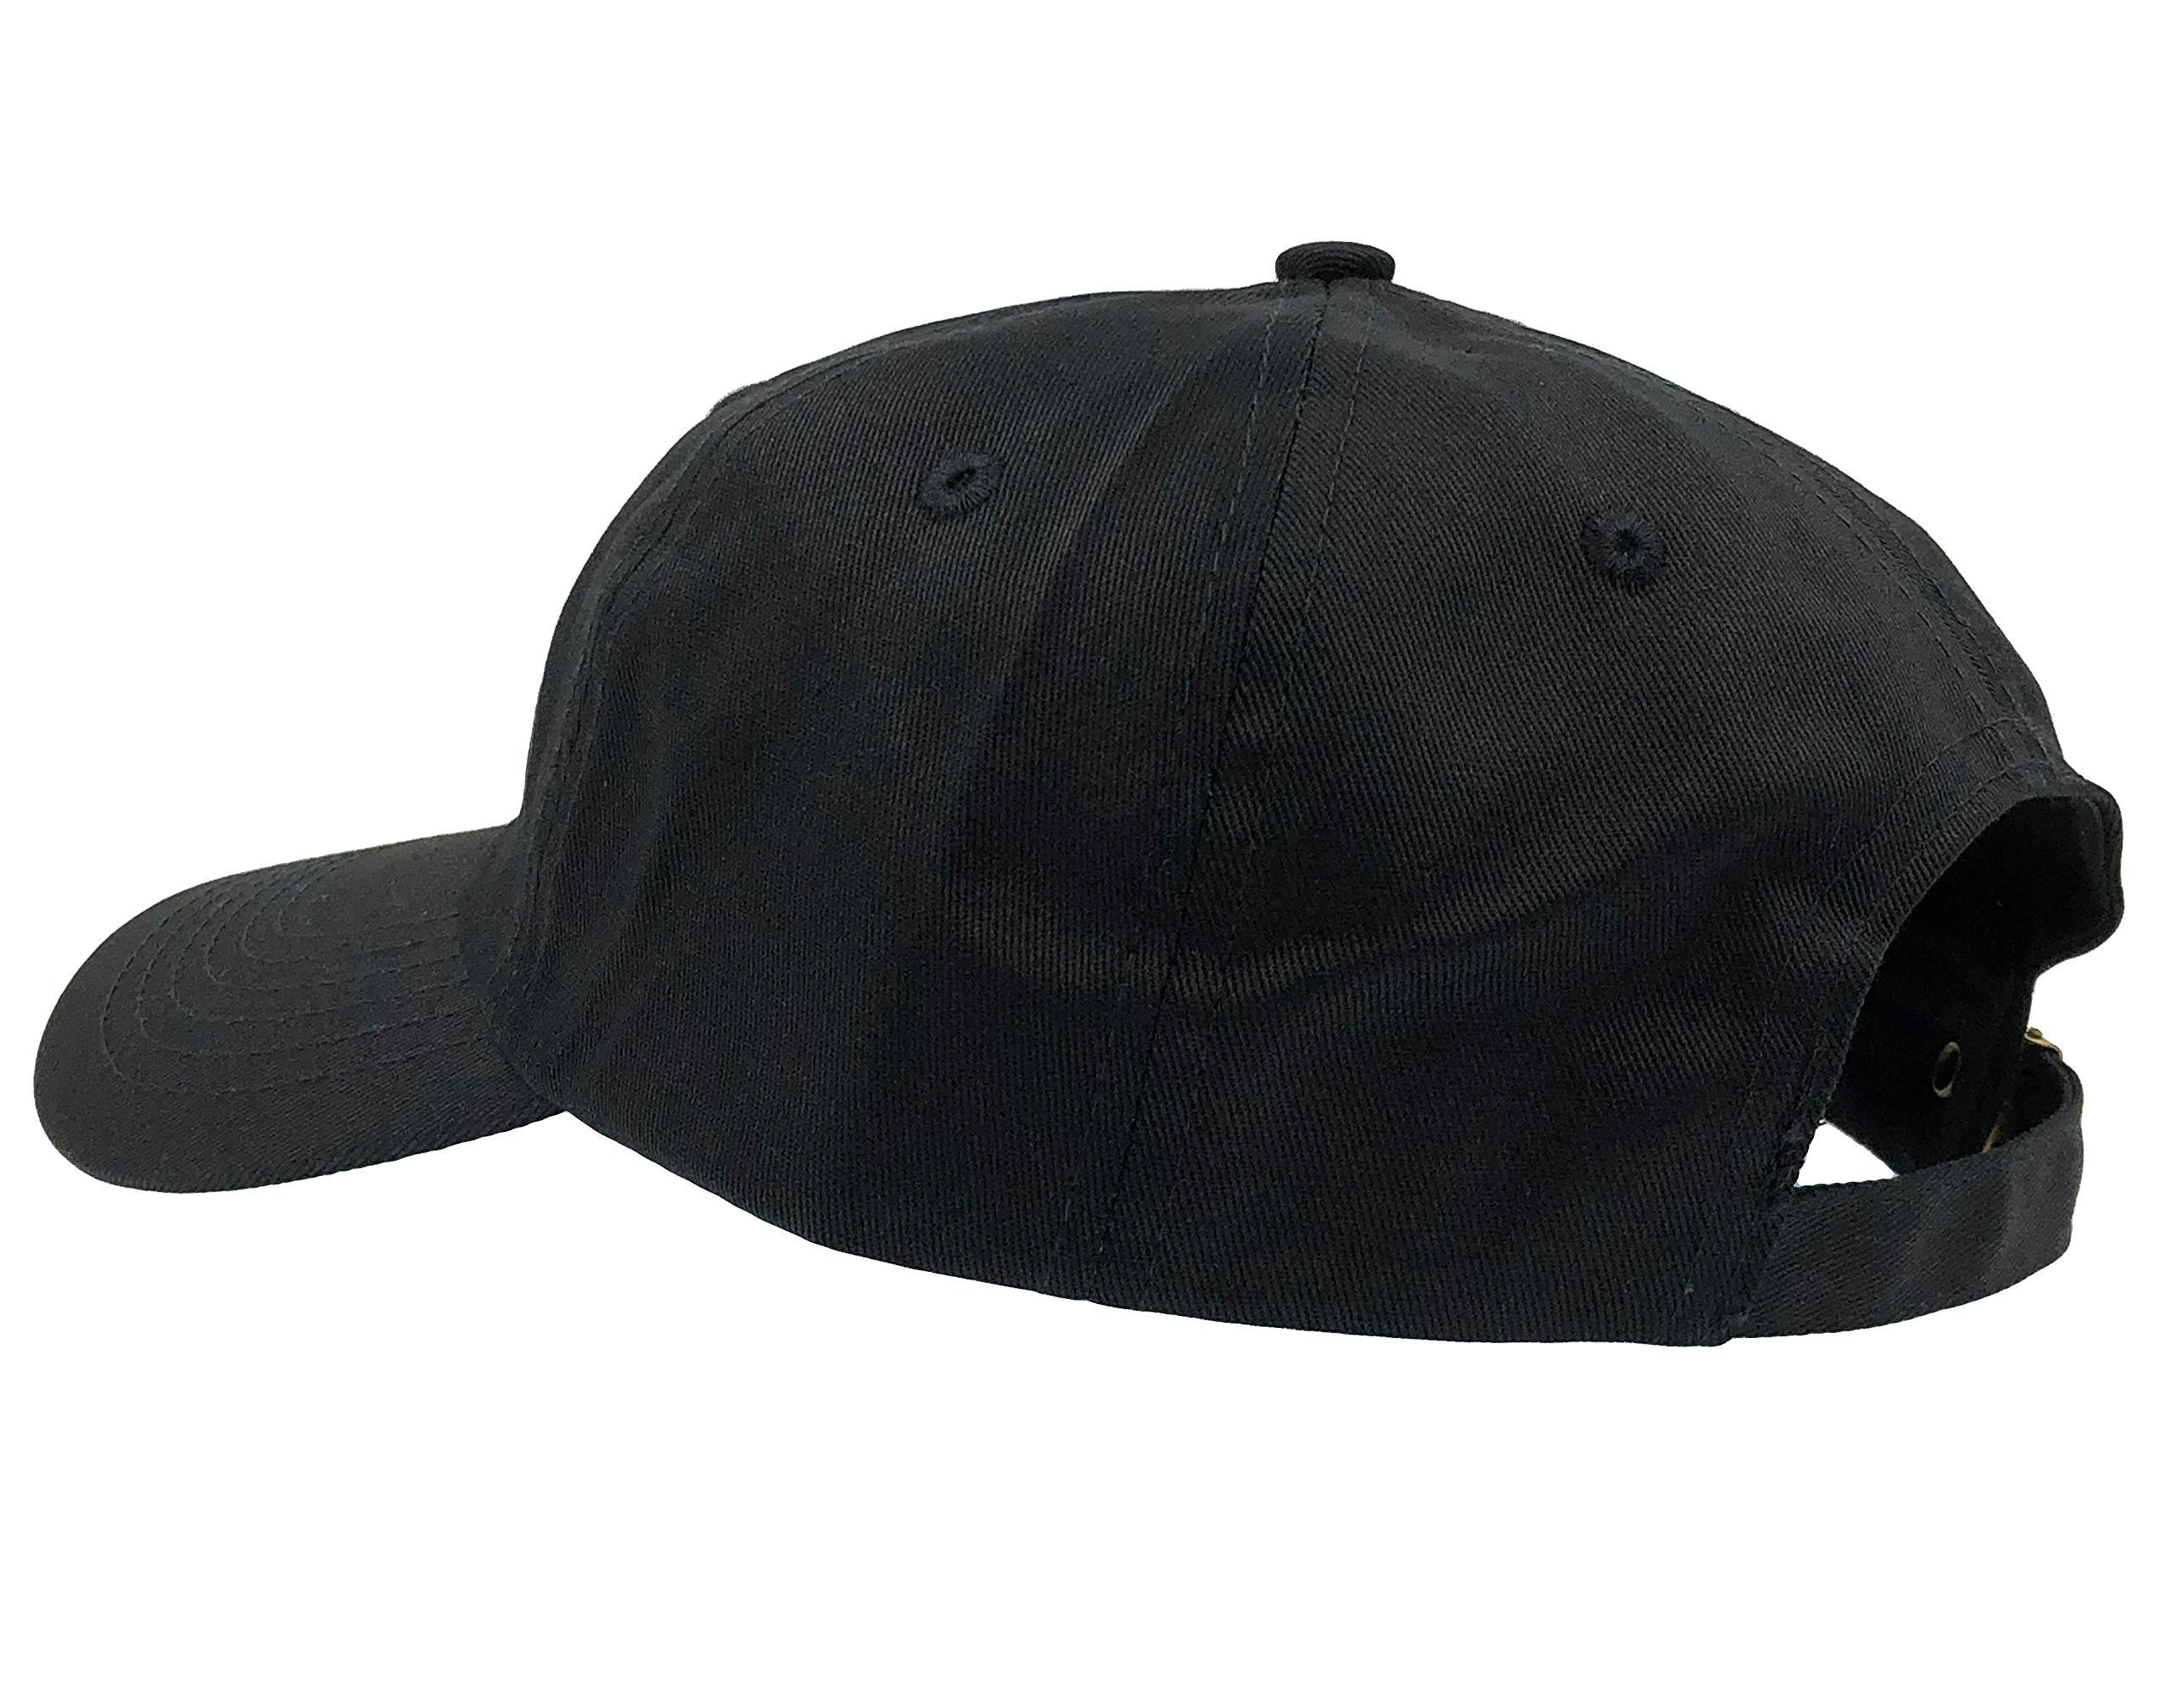 6f7f3ef8 SYWHPS All That Hat Dad Cap 90s Baseball Adjustable Strapback (Black ...